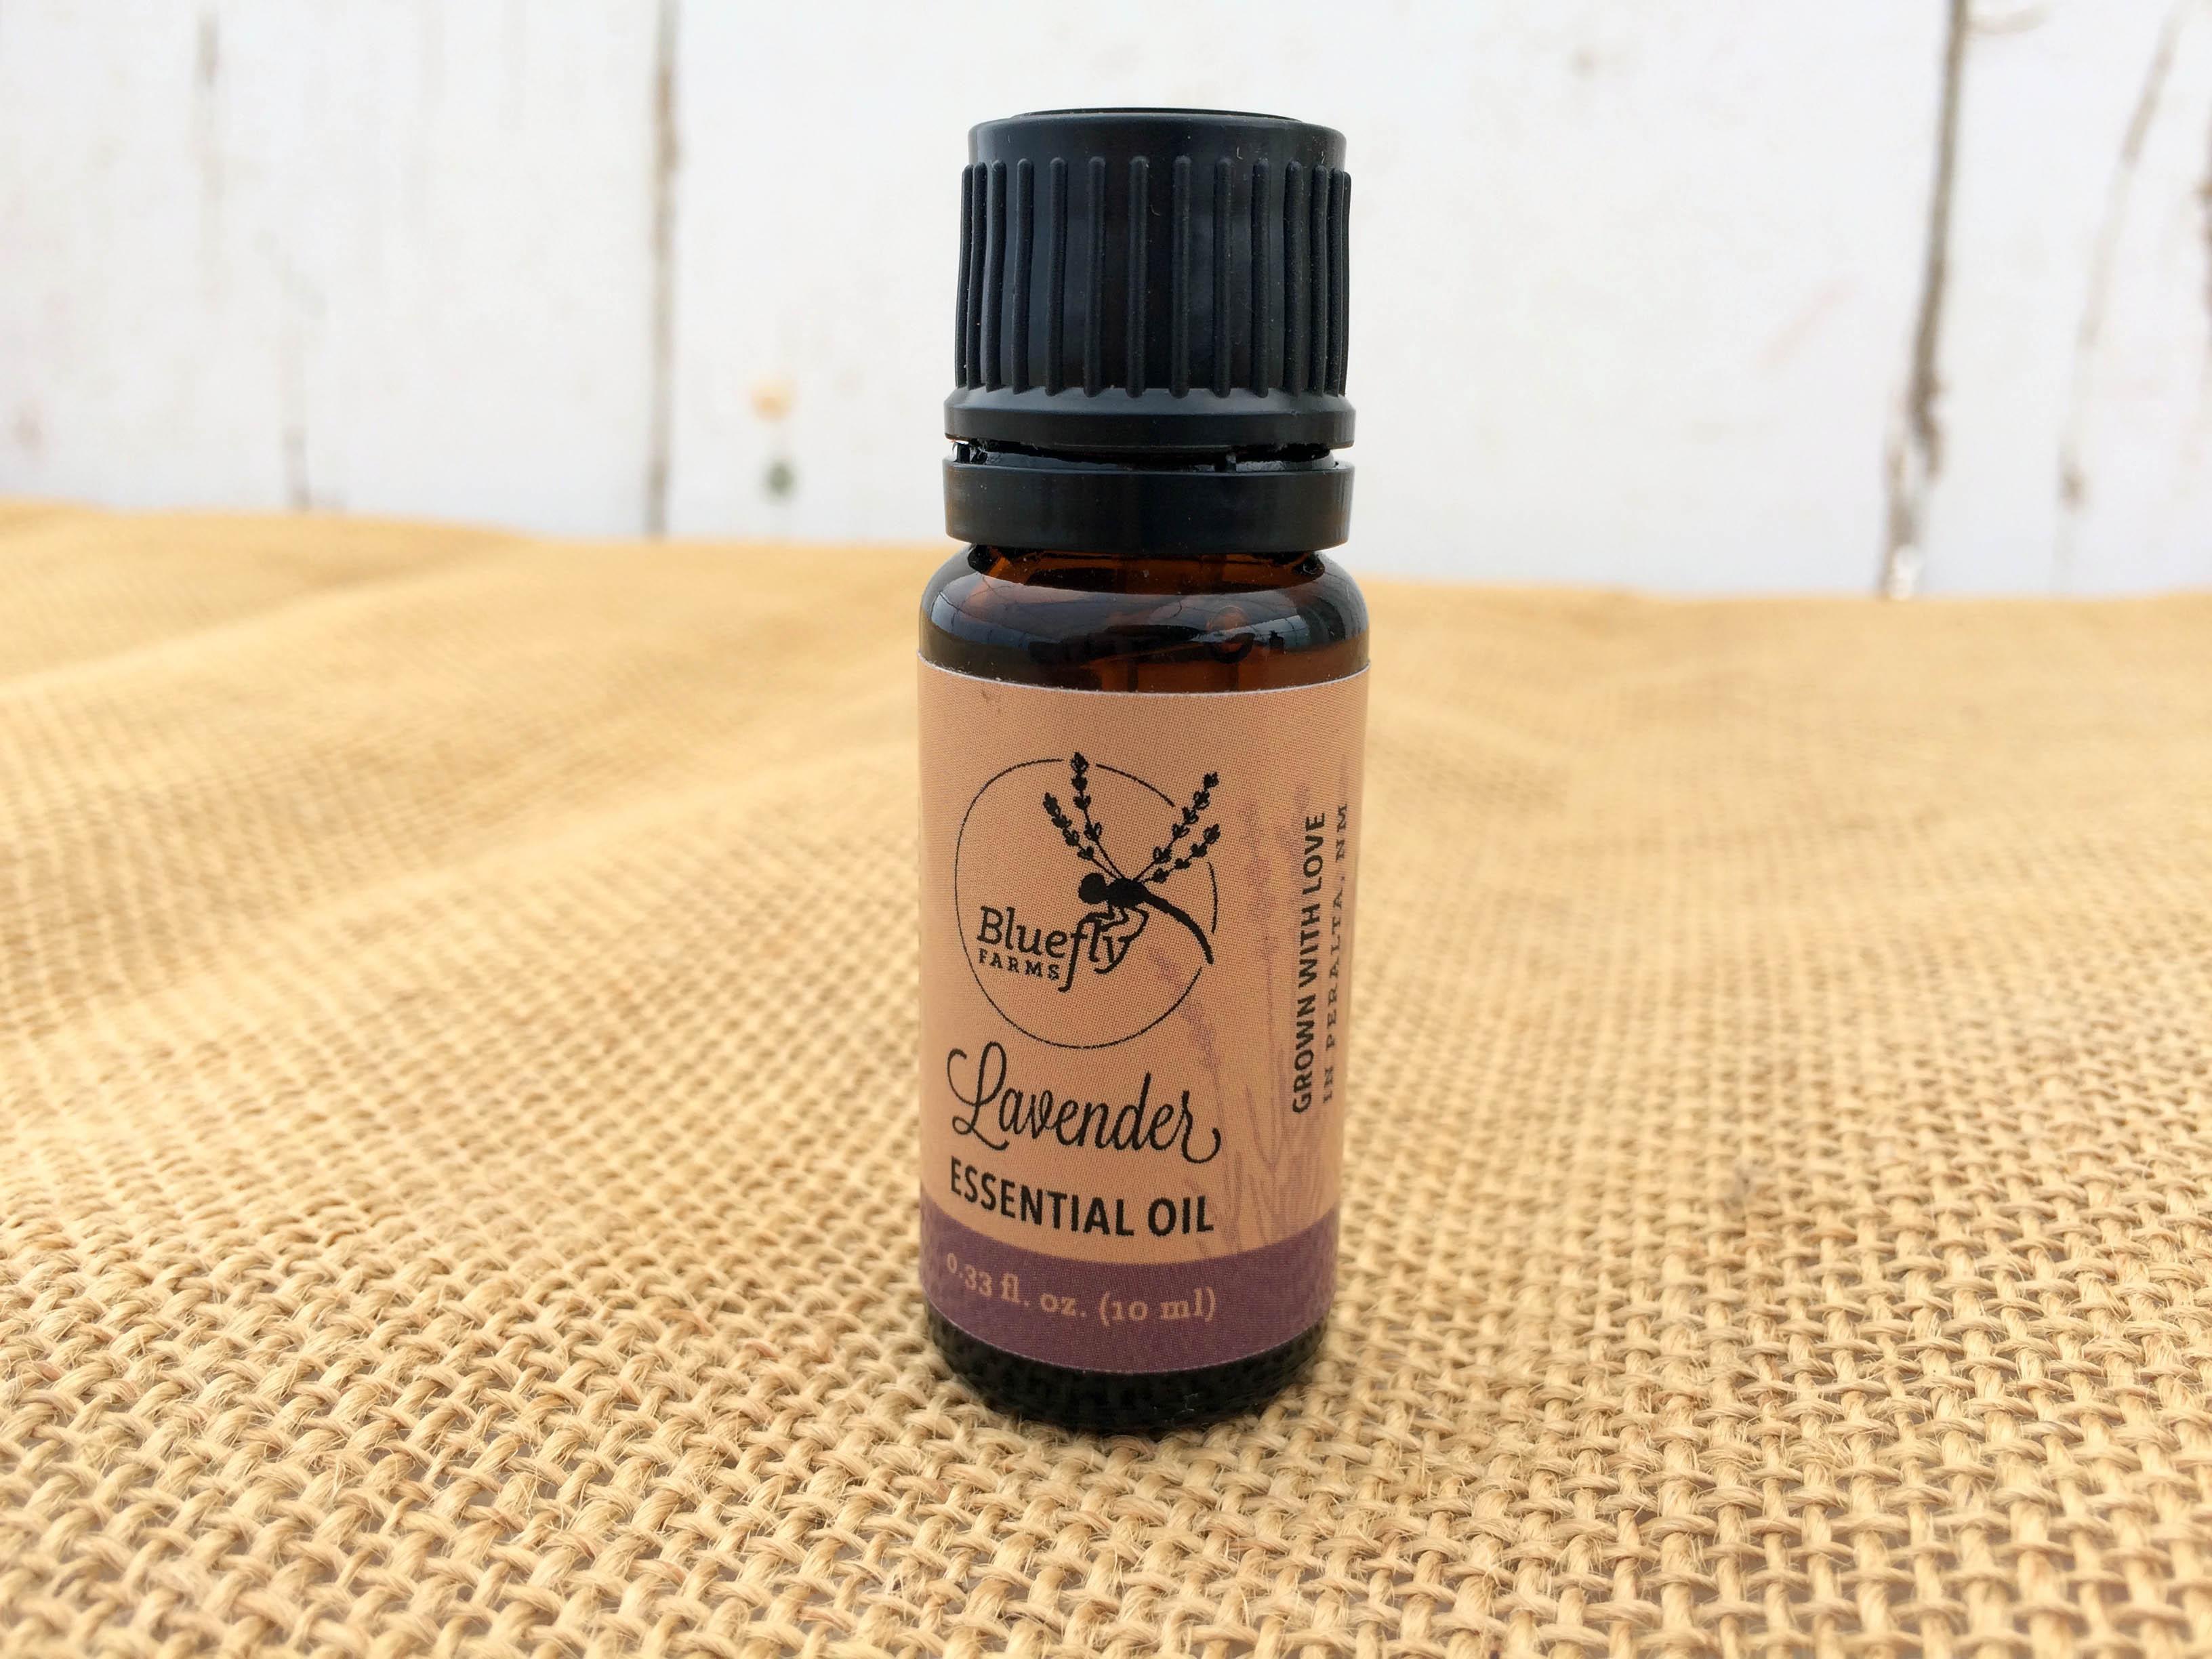 Lavender Essential Oil 10ml Steam Distilled from Organic Lavender